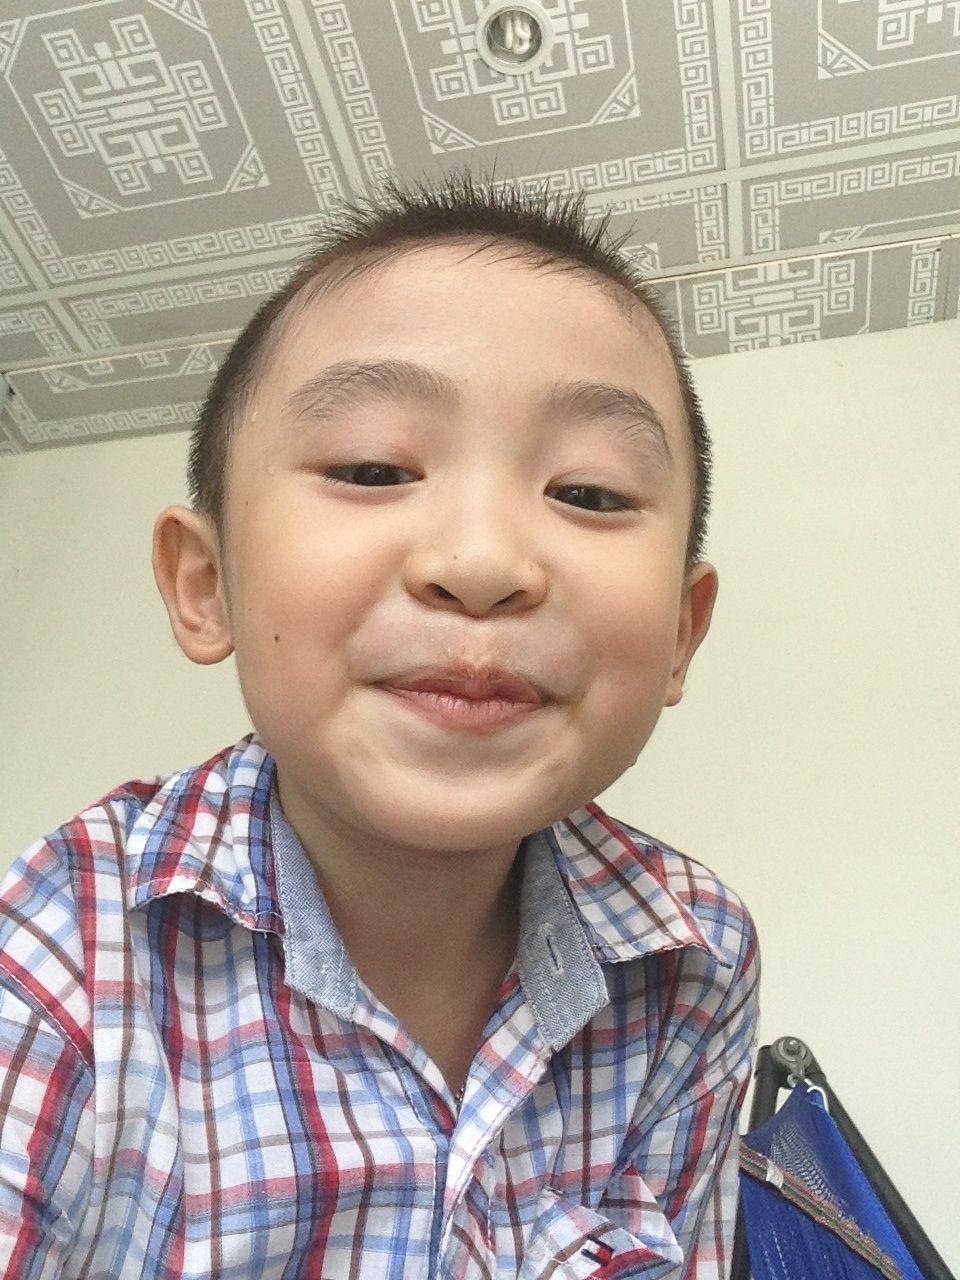 Lê Minh Đạt | Le Minh Dat http://vovananh.name.vn/le-minh-dat.html